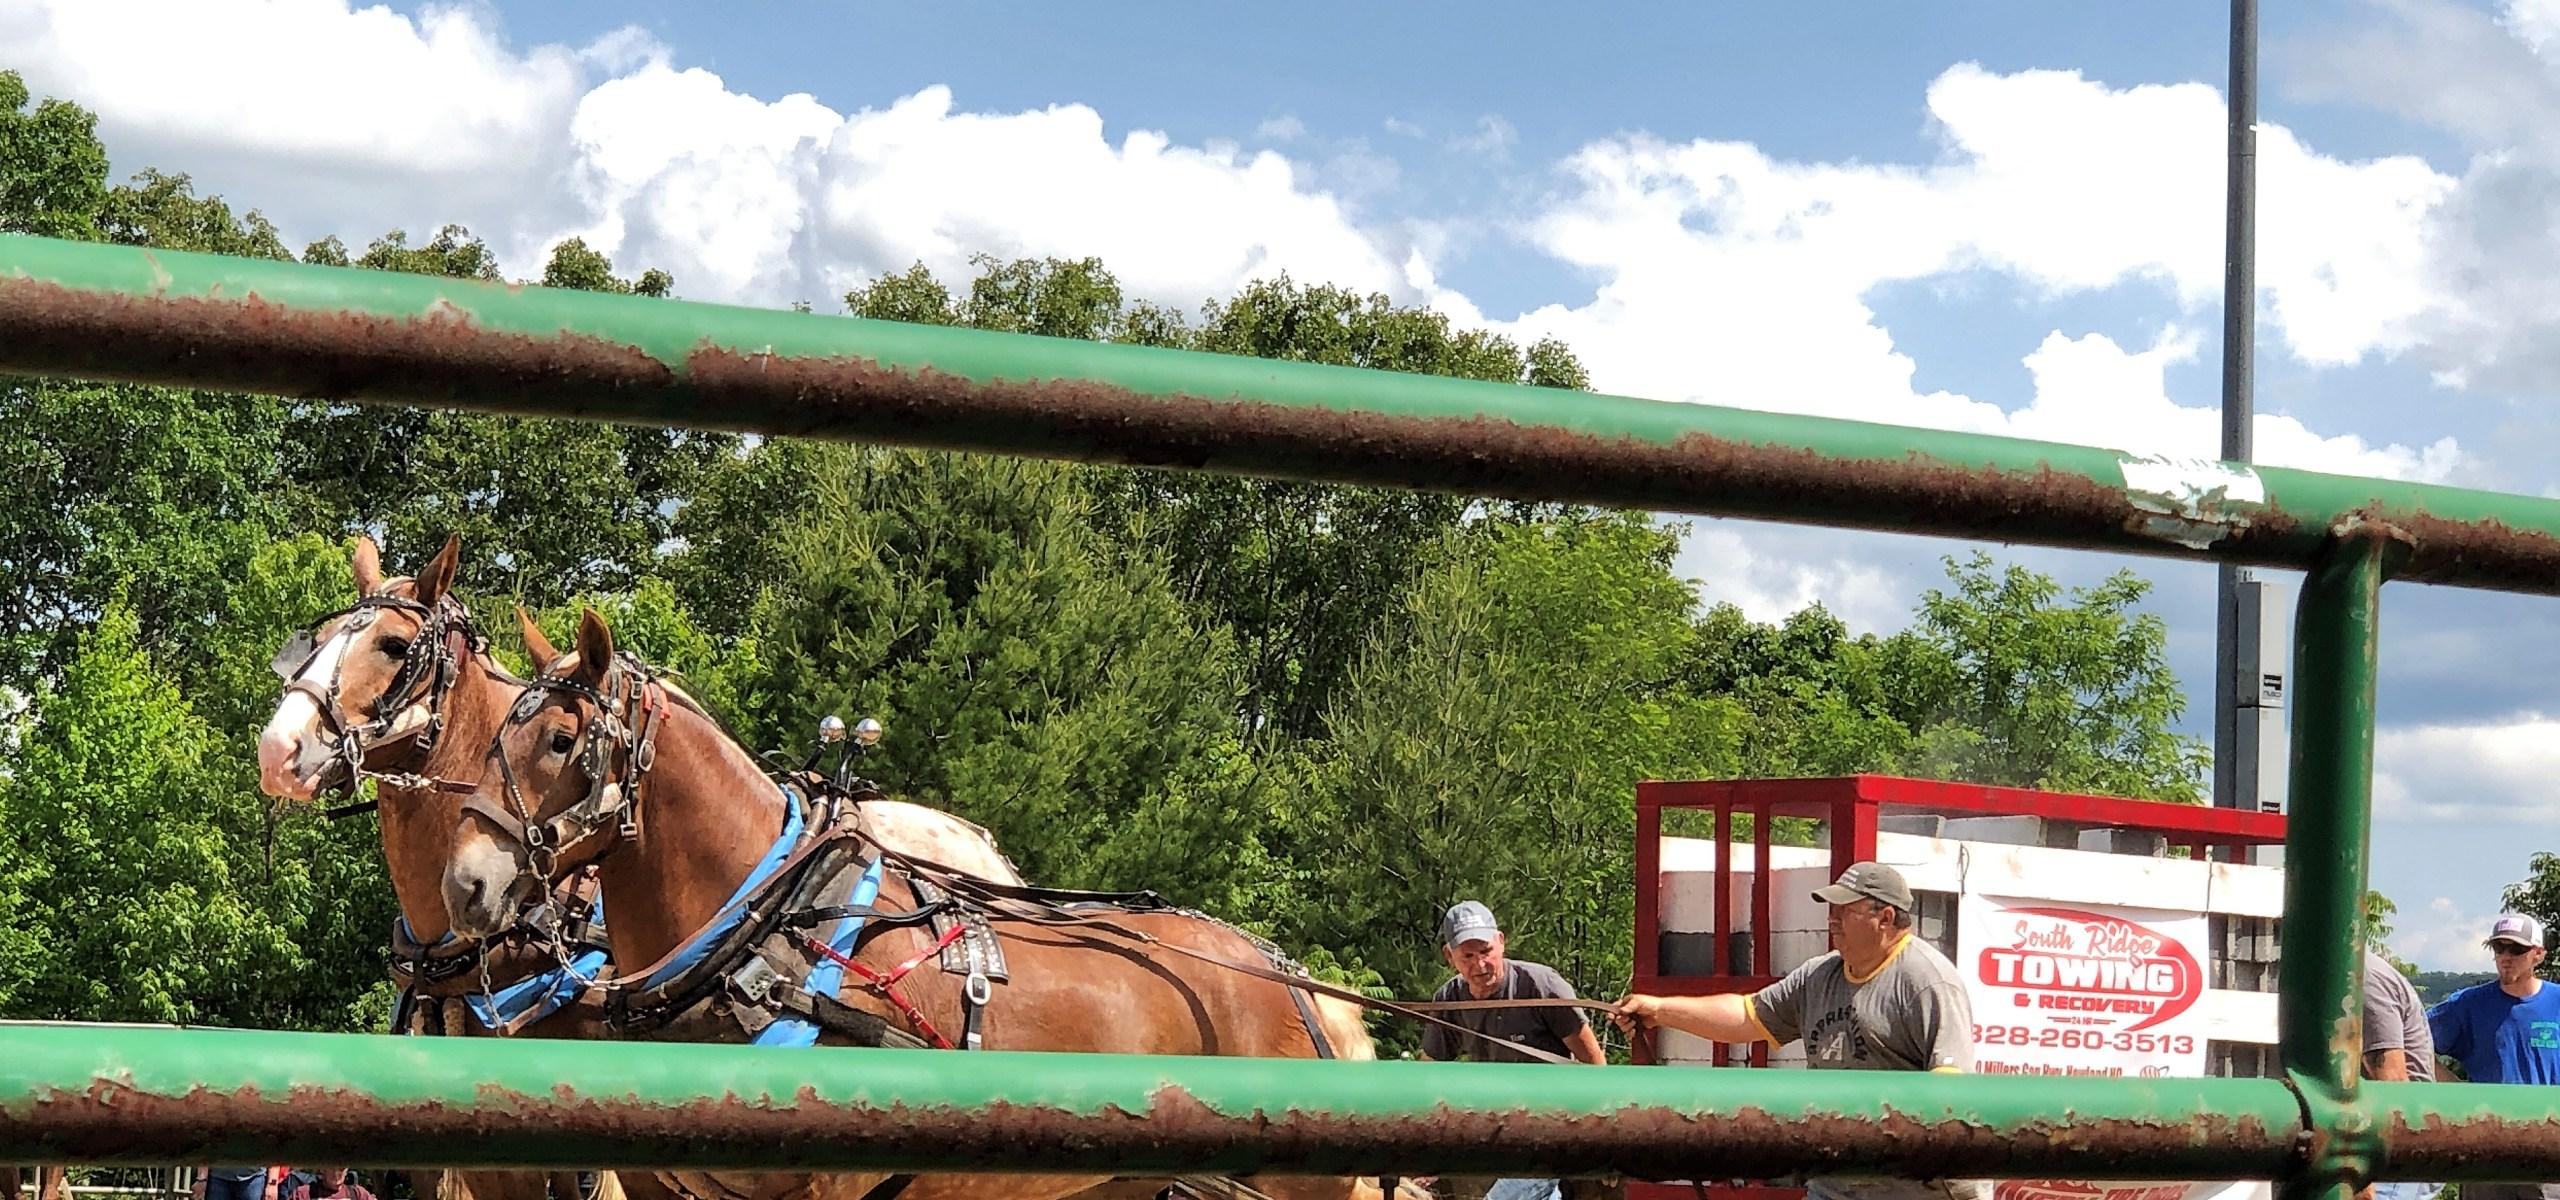 Big Draft horses make the Horse Pull look easy.